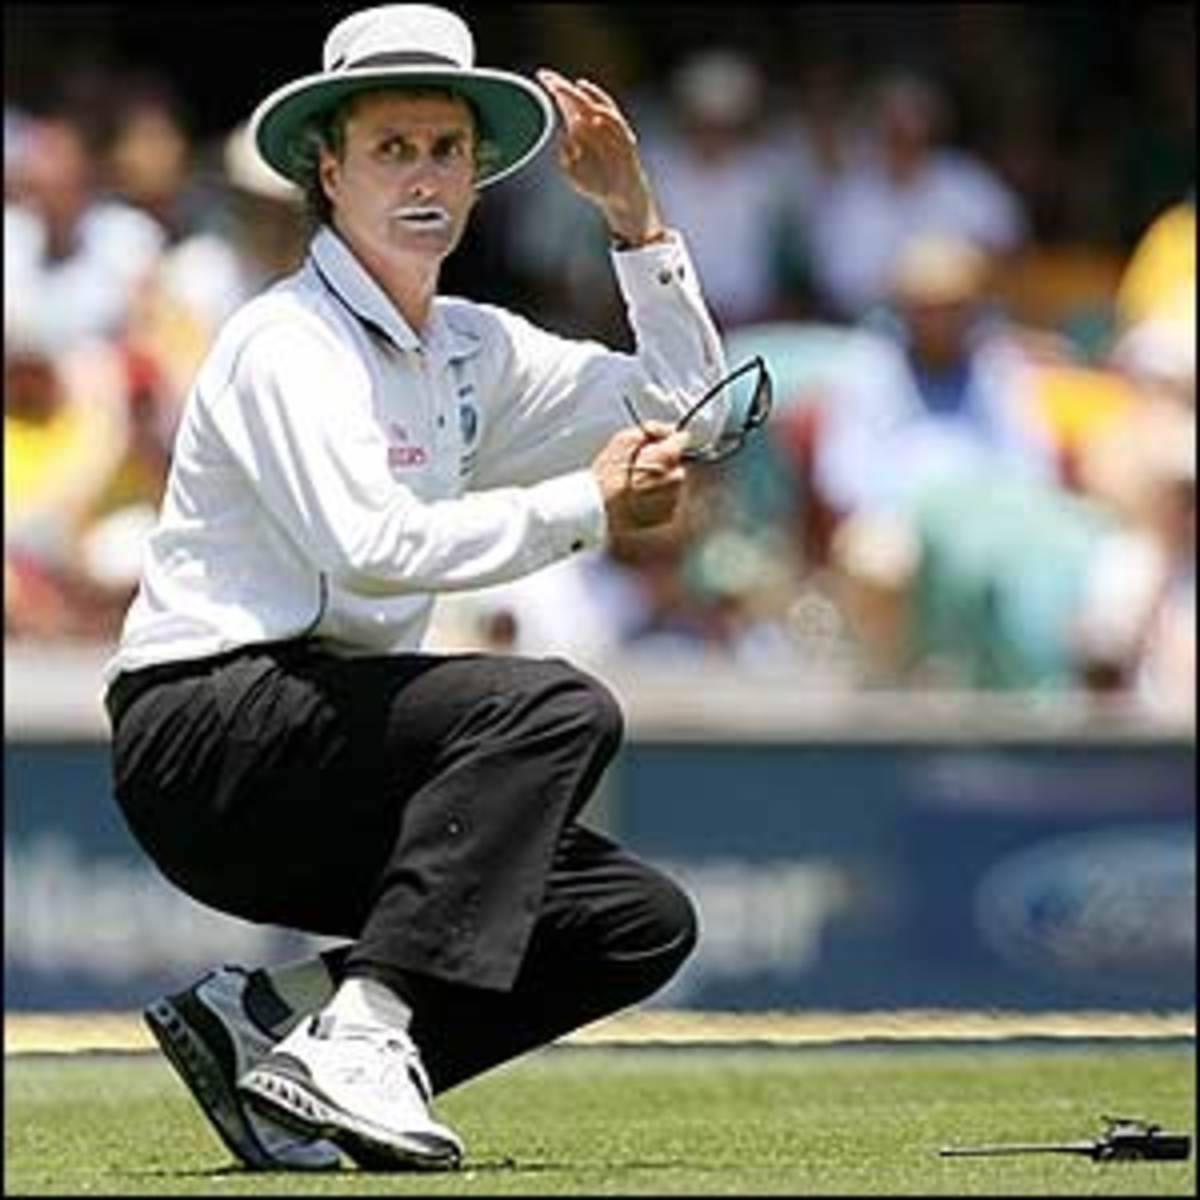 Umpire at a cricket game